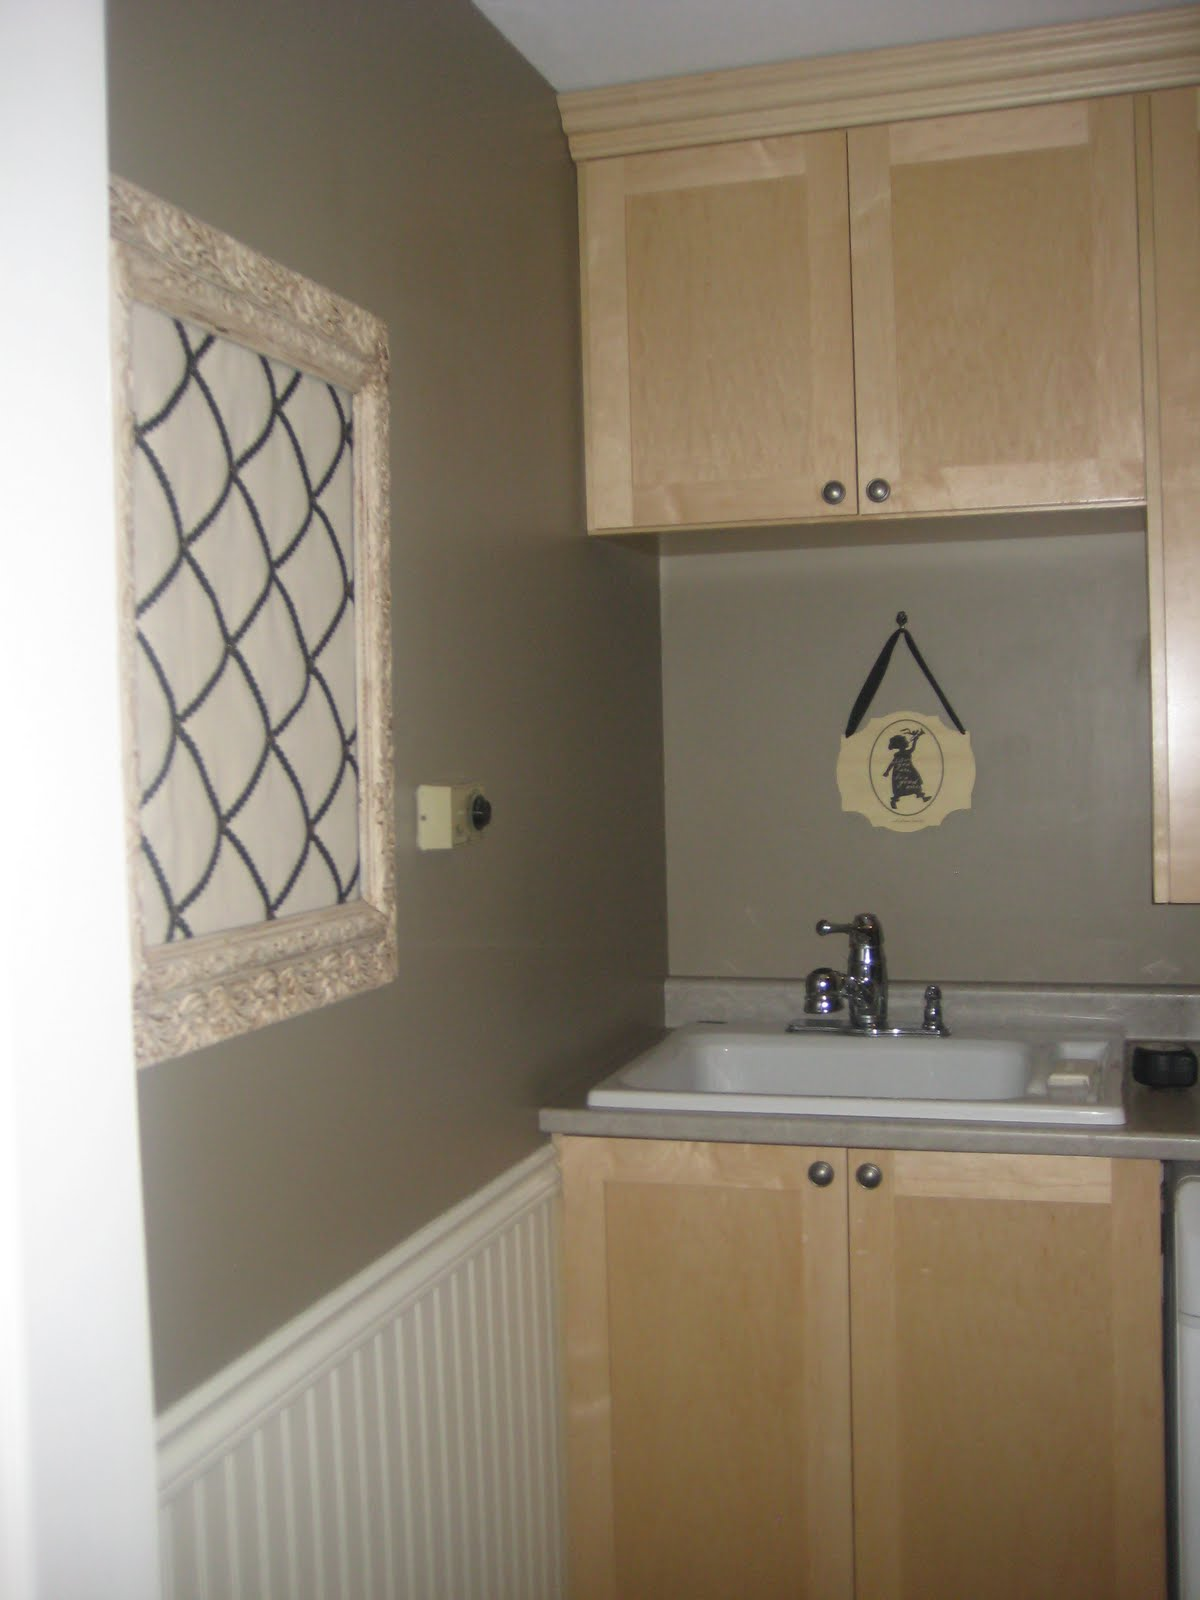 Instal Kitchen Sink On Vanity Overmount No Countertop